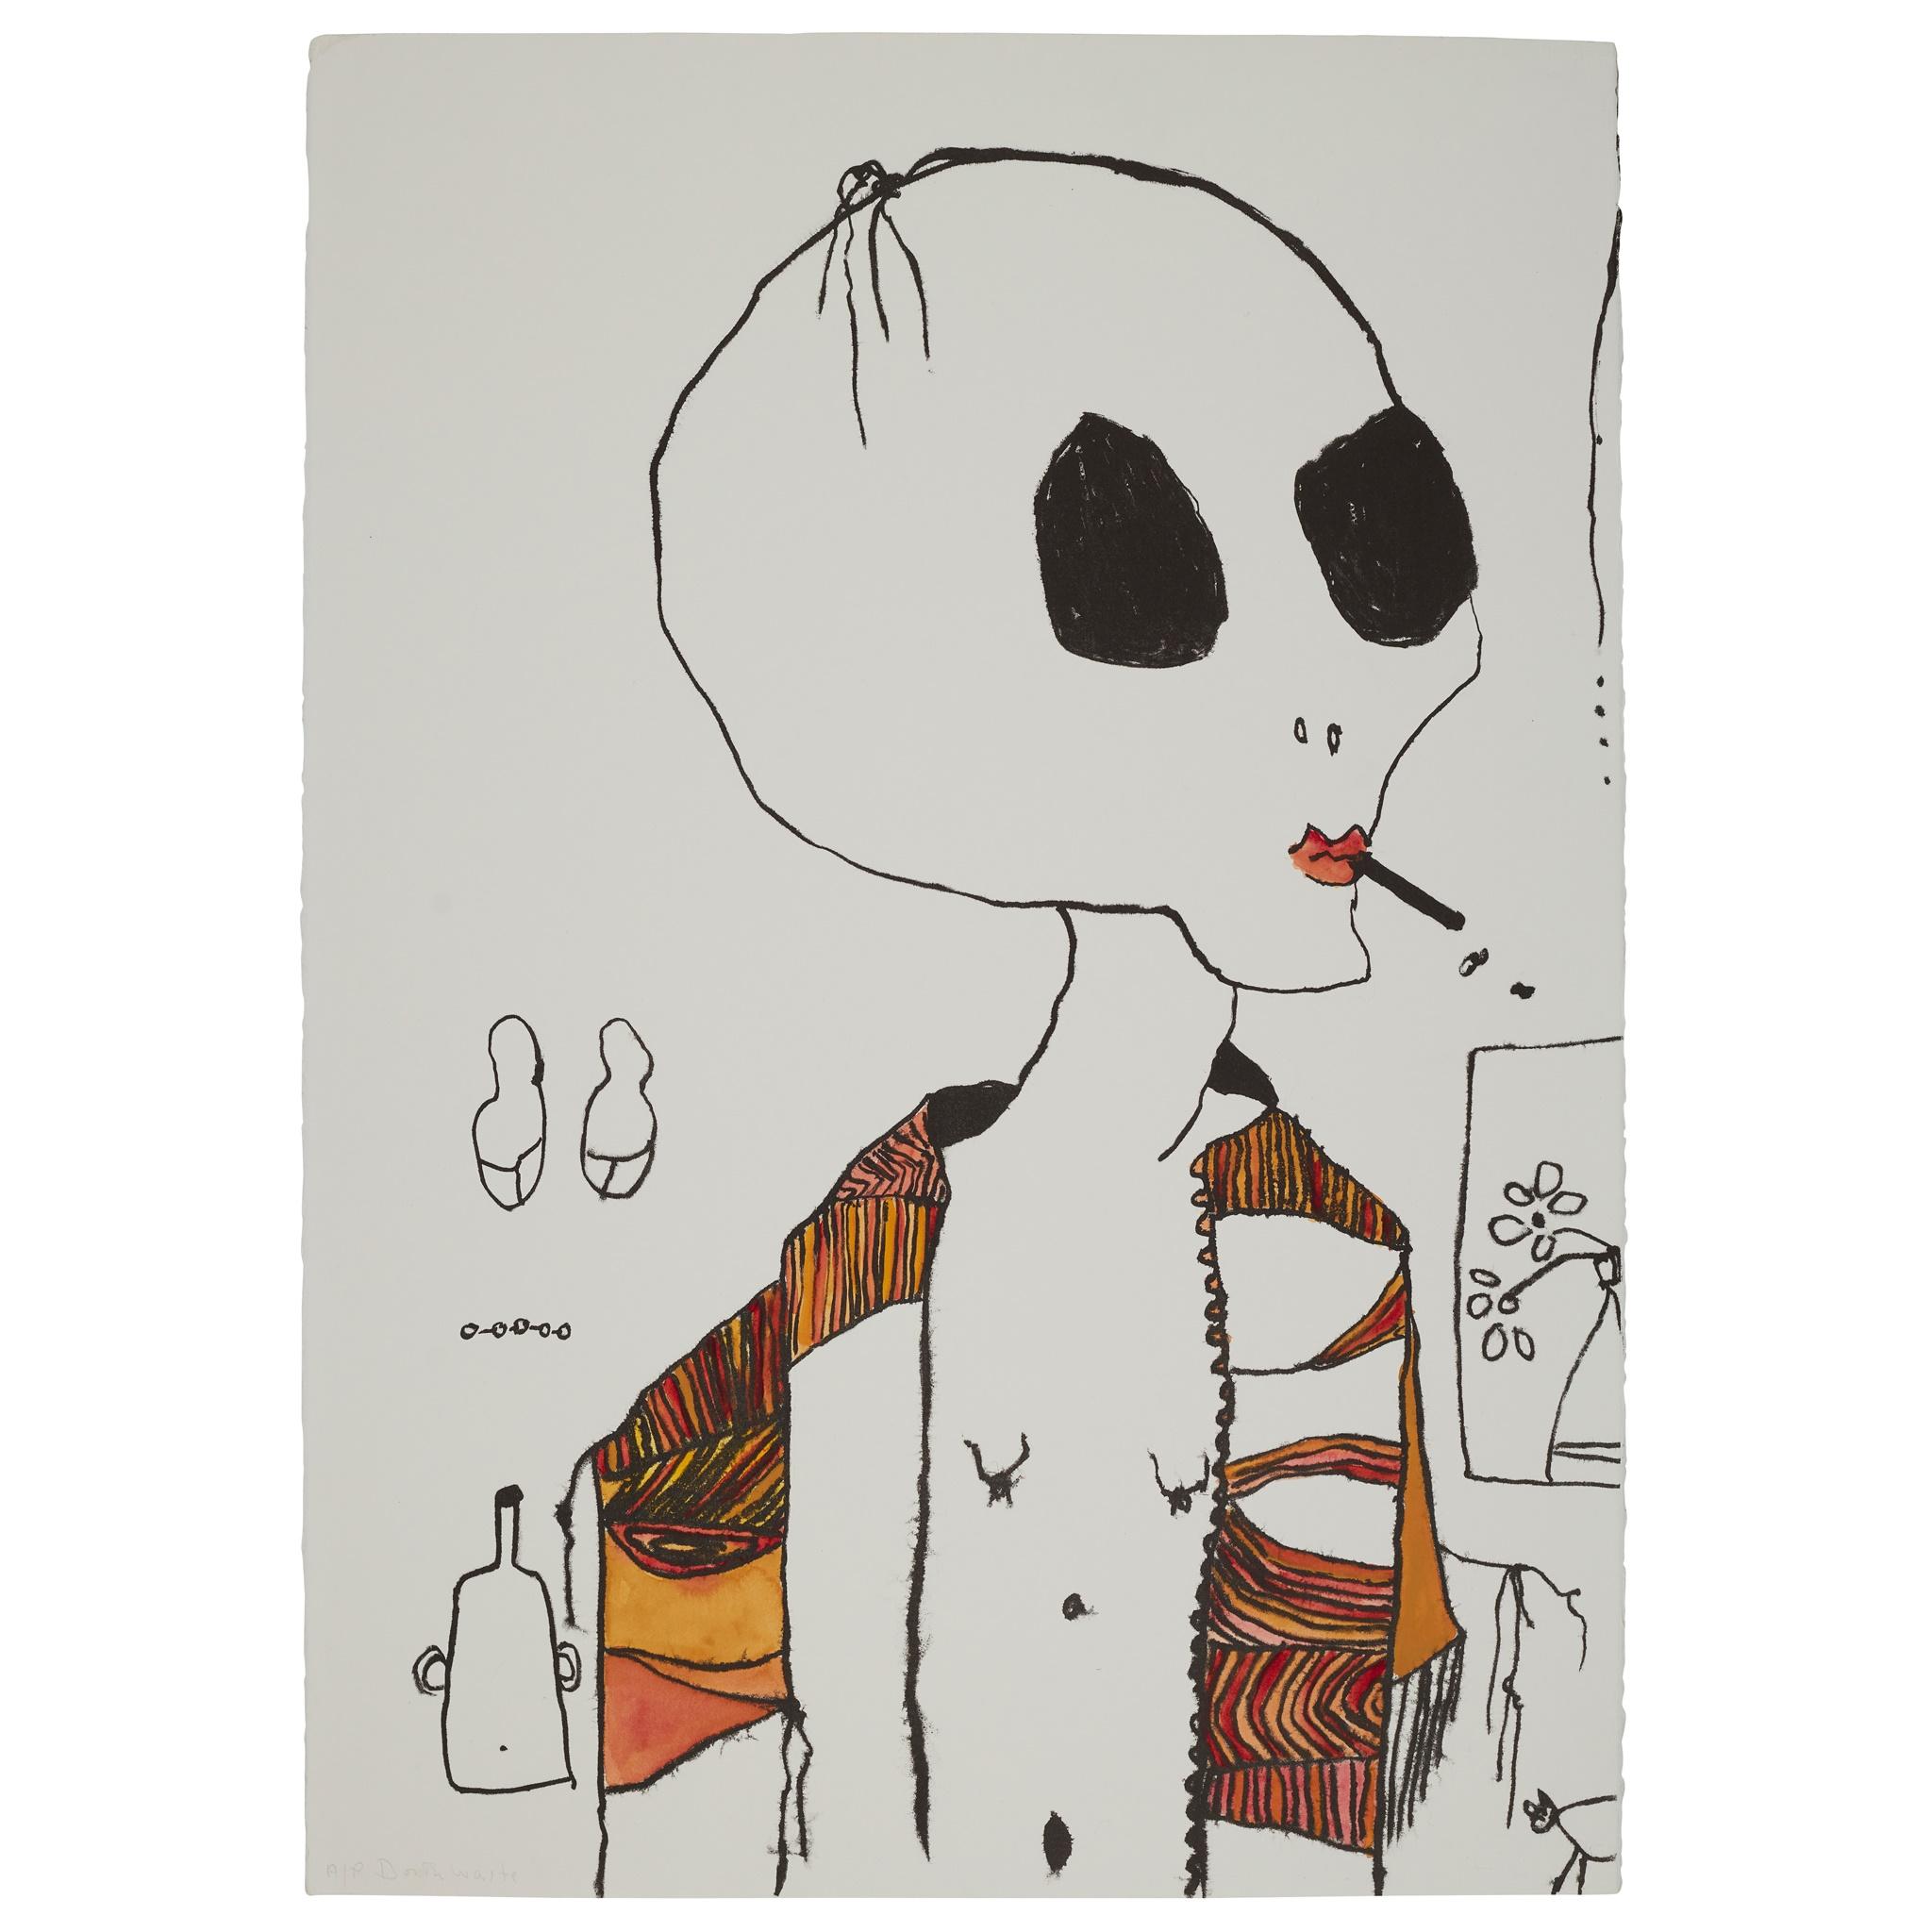 § PATRICIA DOUTHWAITE (SCOTTISH 1939-2002) SMOKER - Image 2 of 3